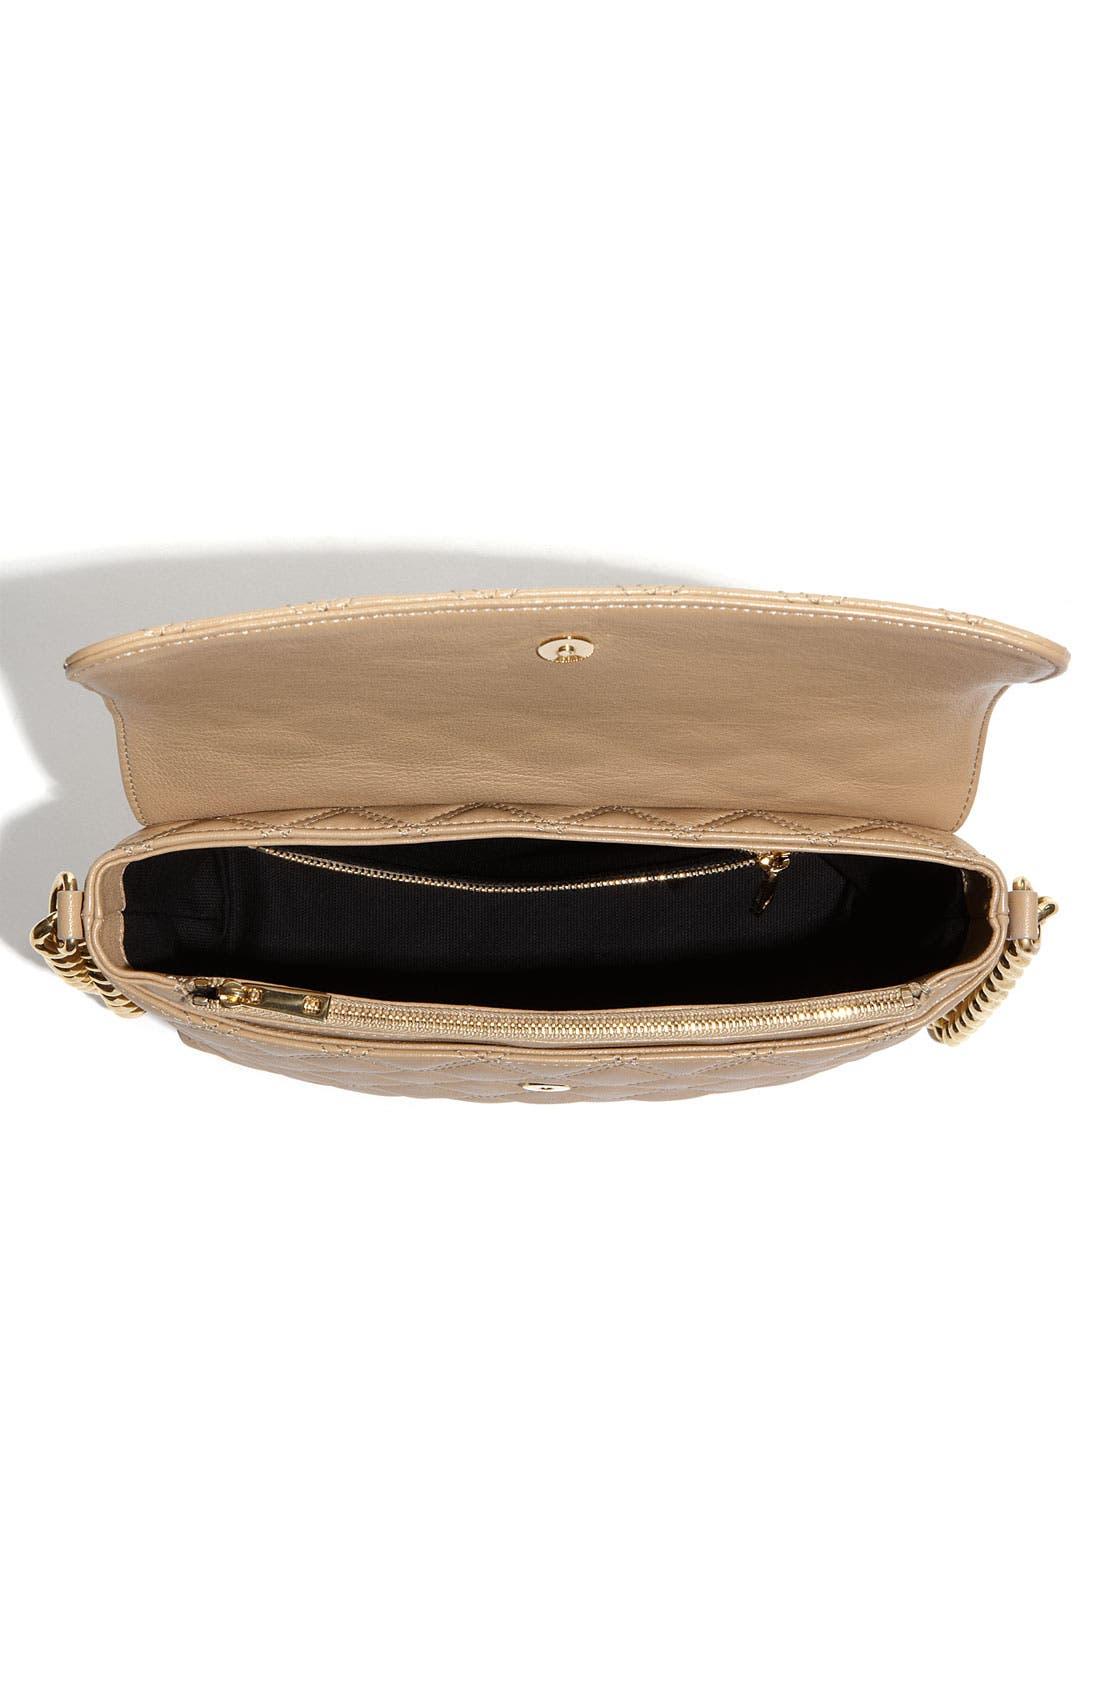 ,                             'Large Quilting Single' Leather Shoulder Bag,                             Alternate thumbnail 28, color,                             255